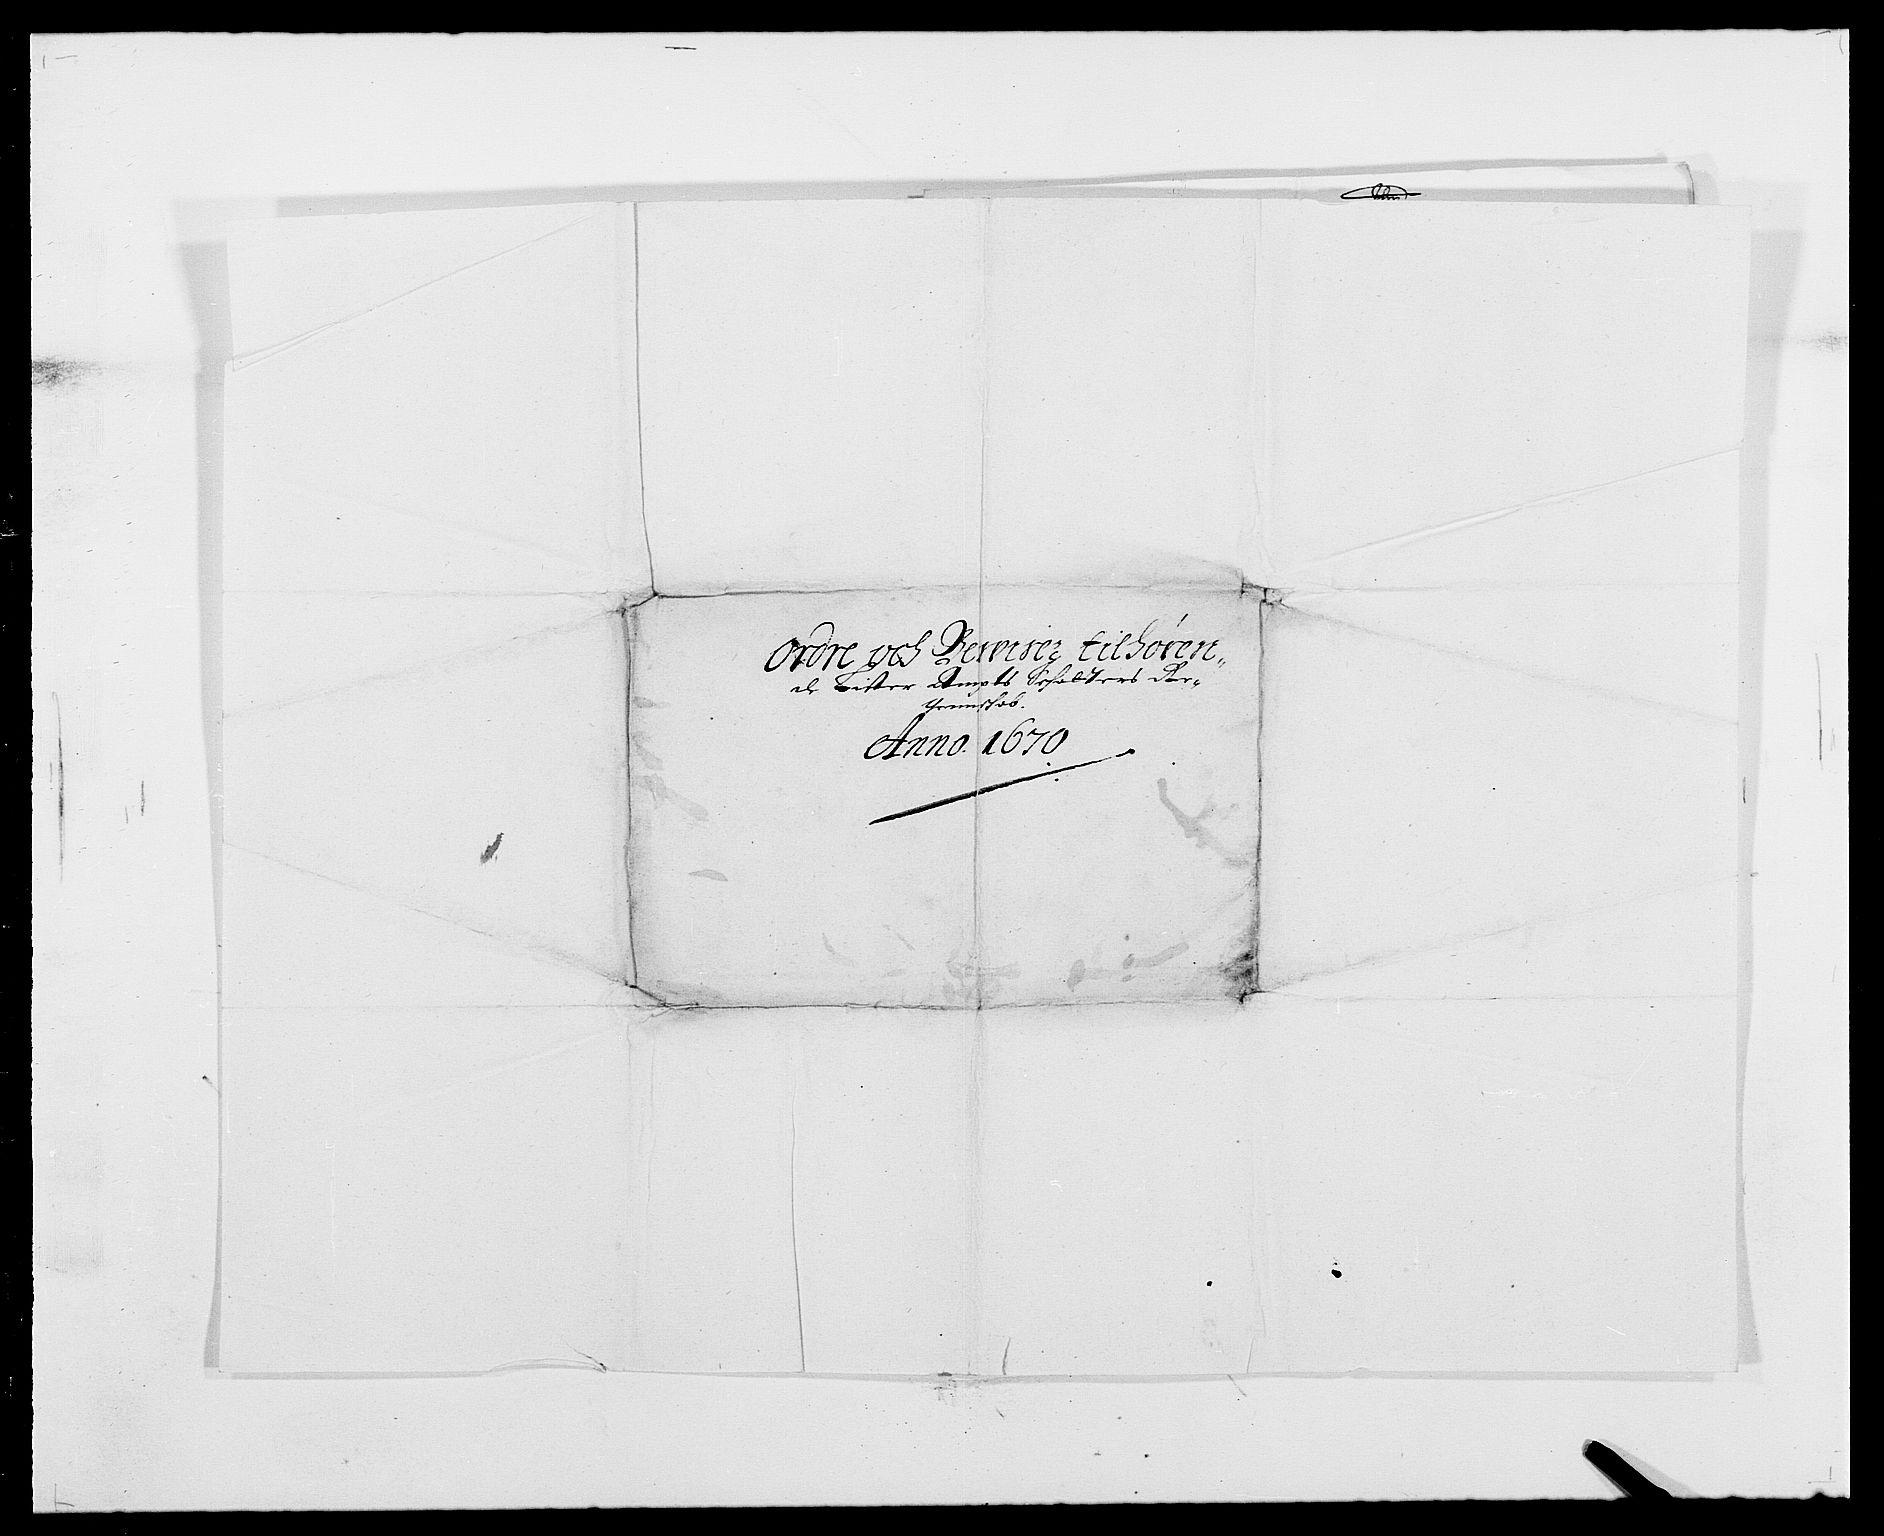 RA, Rentekammeret inntil 1814, Reviderte regnskaper, Fogderegnskap, R41/L2525: Fogderegnskap Lista, 1669-1671, s. 141